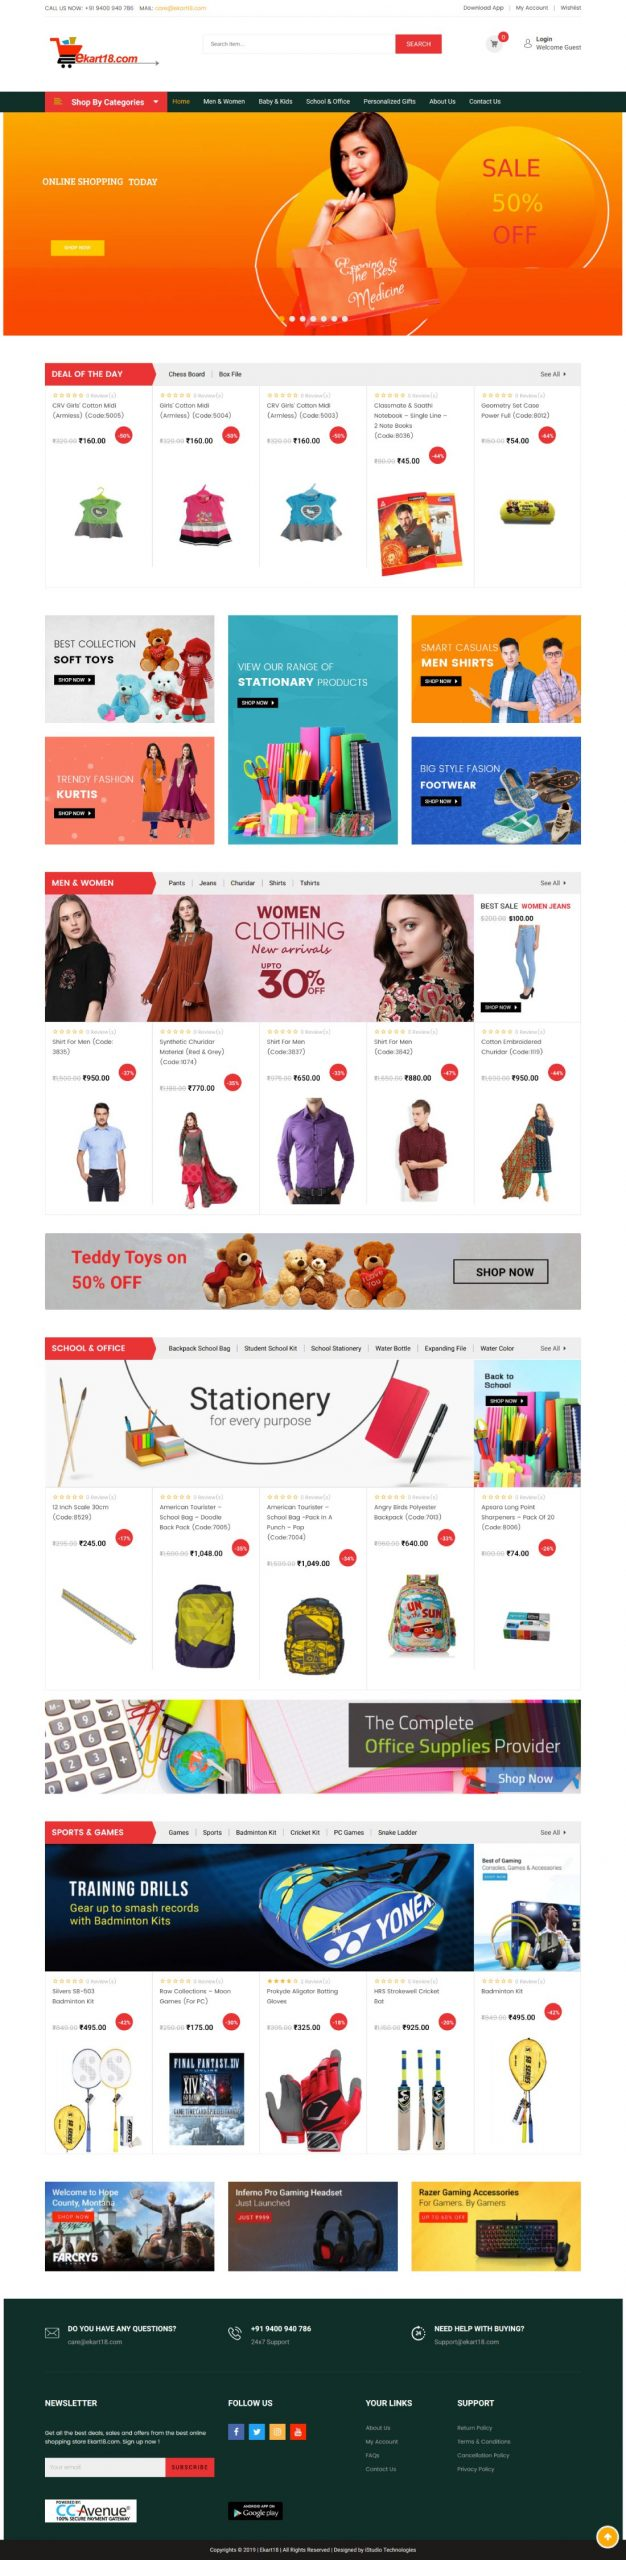 ekart18   Web Design Company Web Development Company in Chennai